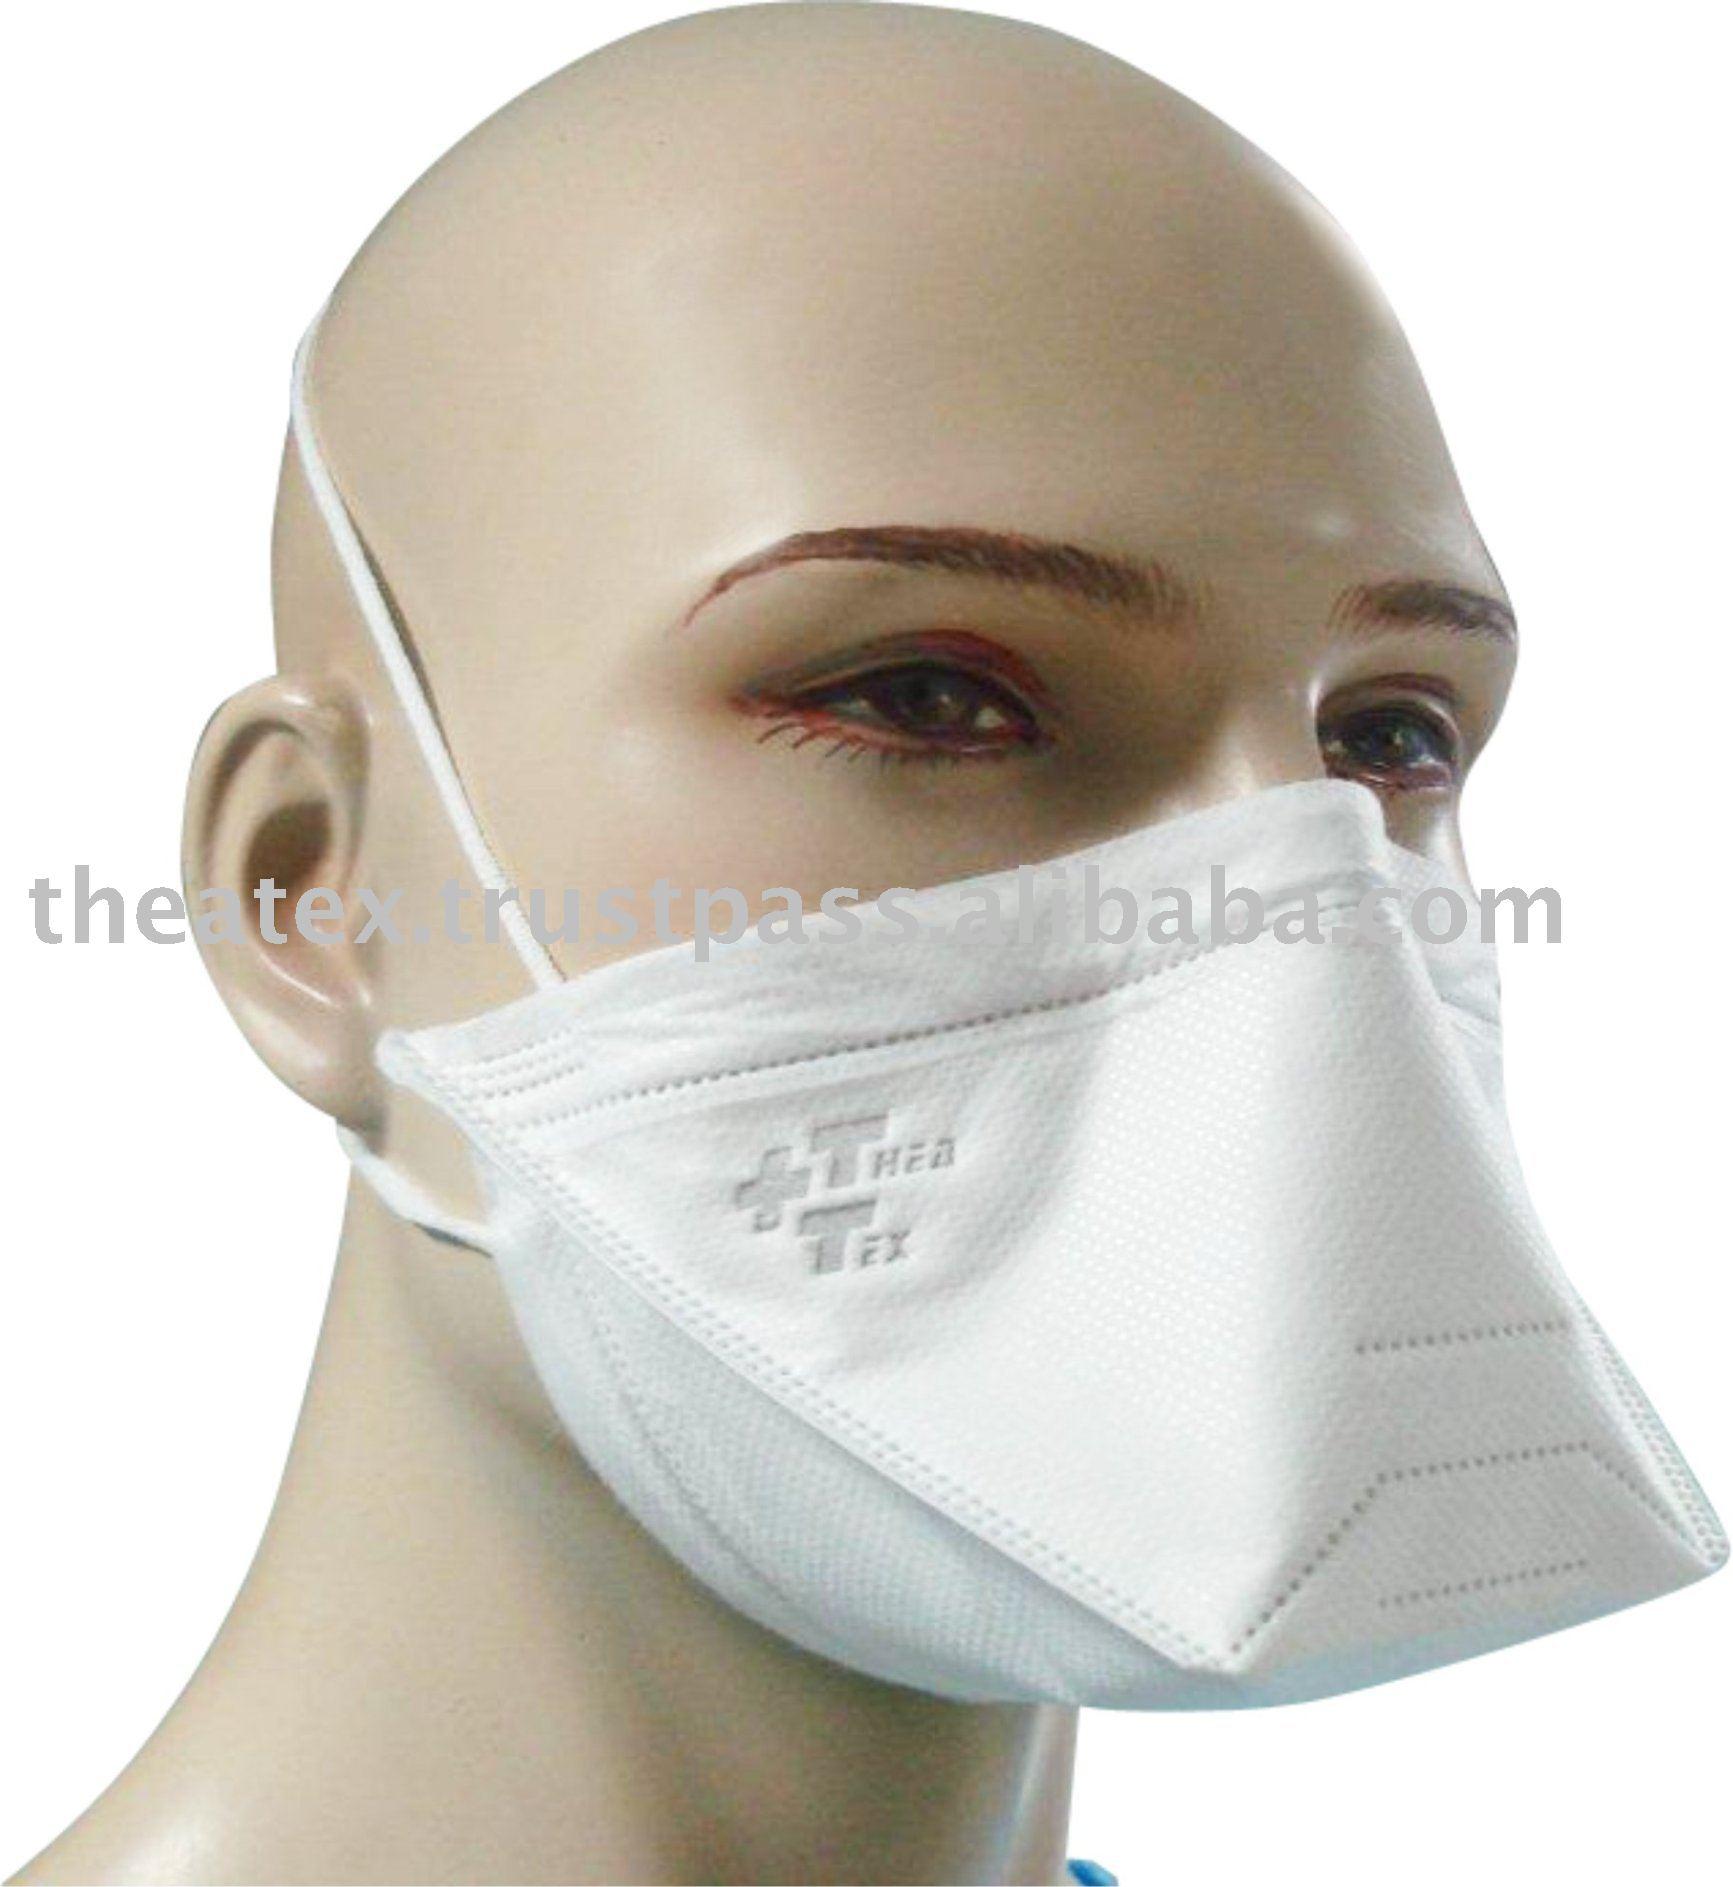 - Alibaba com Maschera Niosh Buy Maschera Product N95 On Respiratore n95